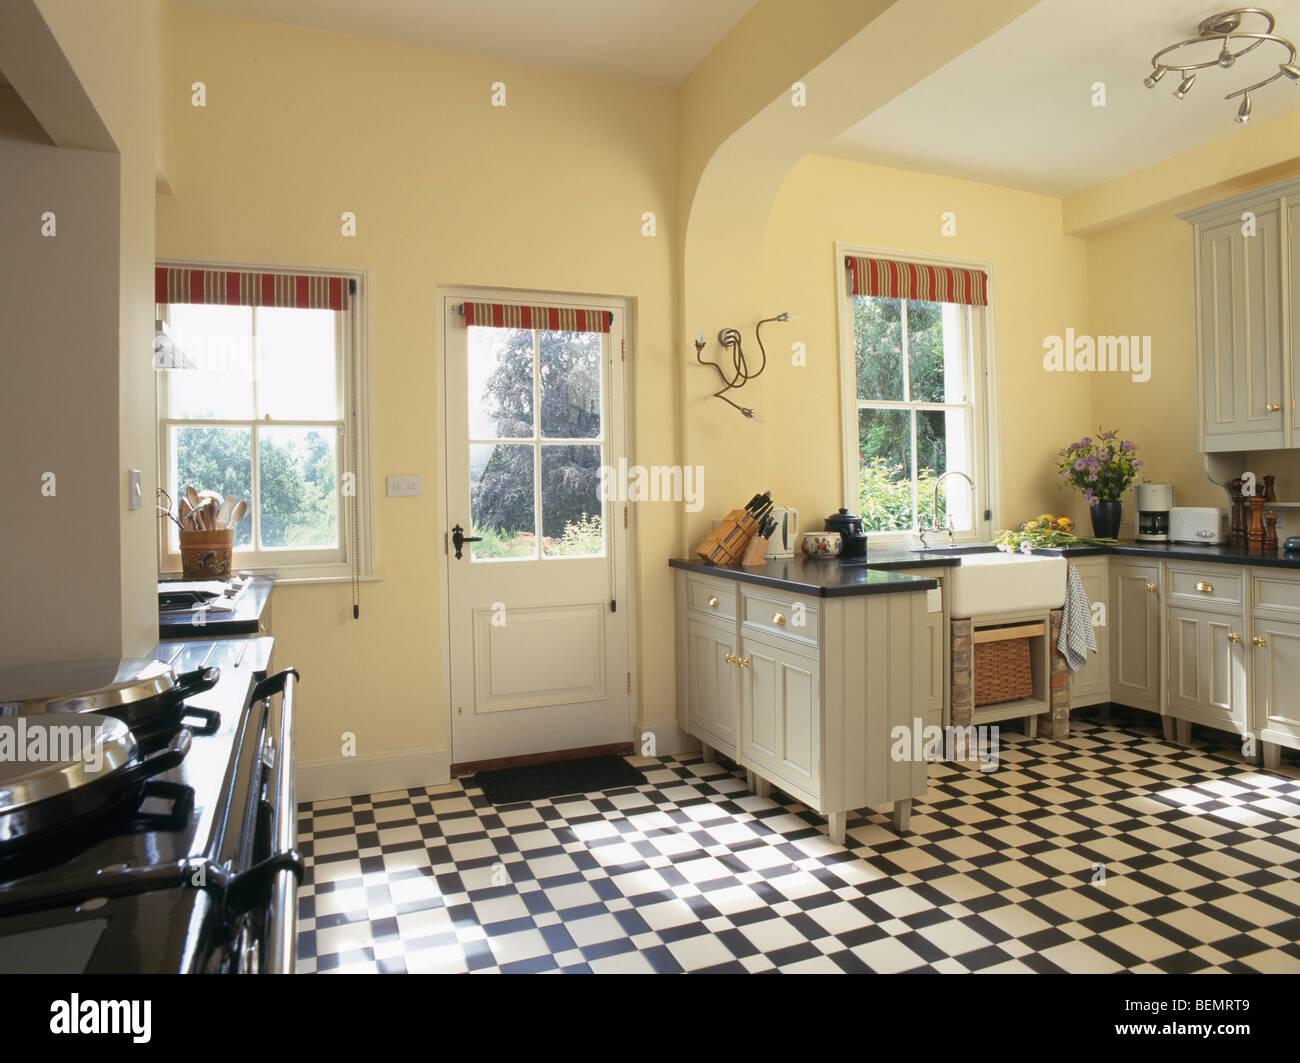 Black White Vinyl Flooring In Pastel Yellow Country Kitchen Stock